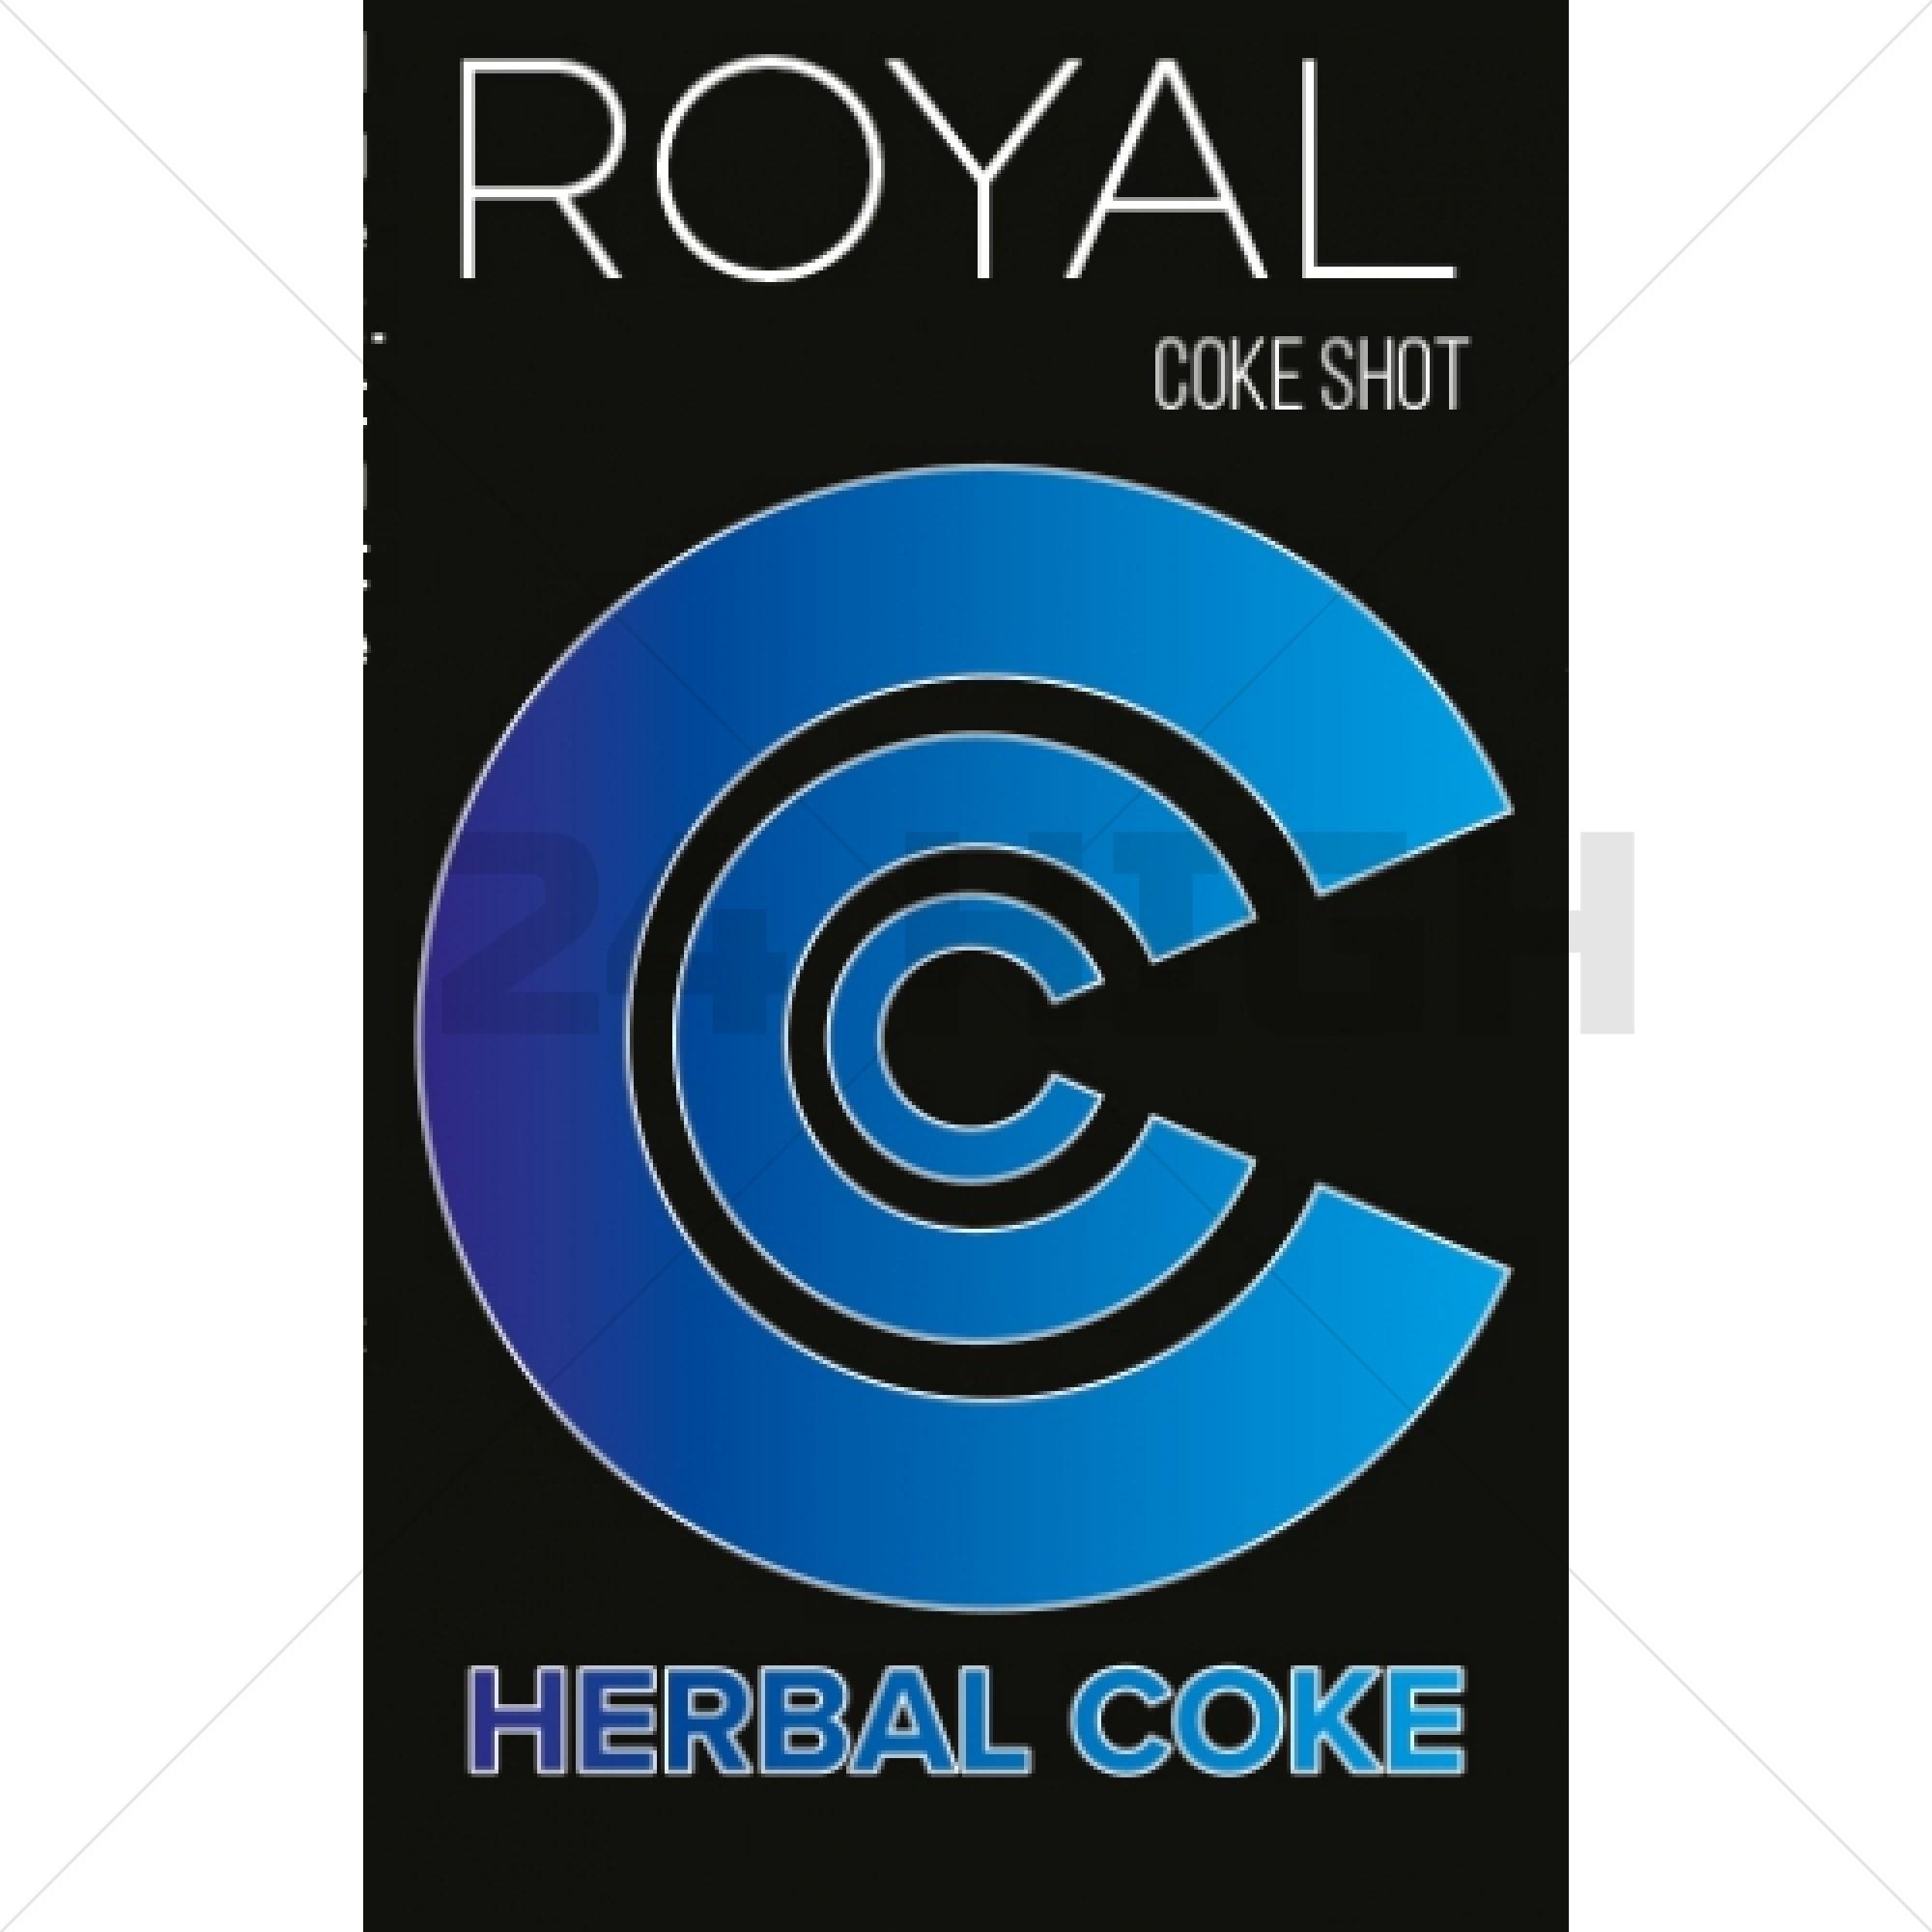 Royal Coke